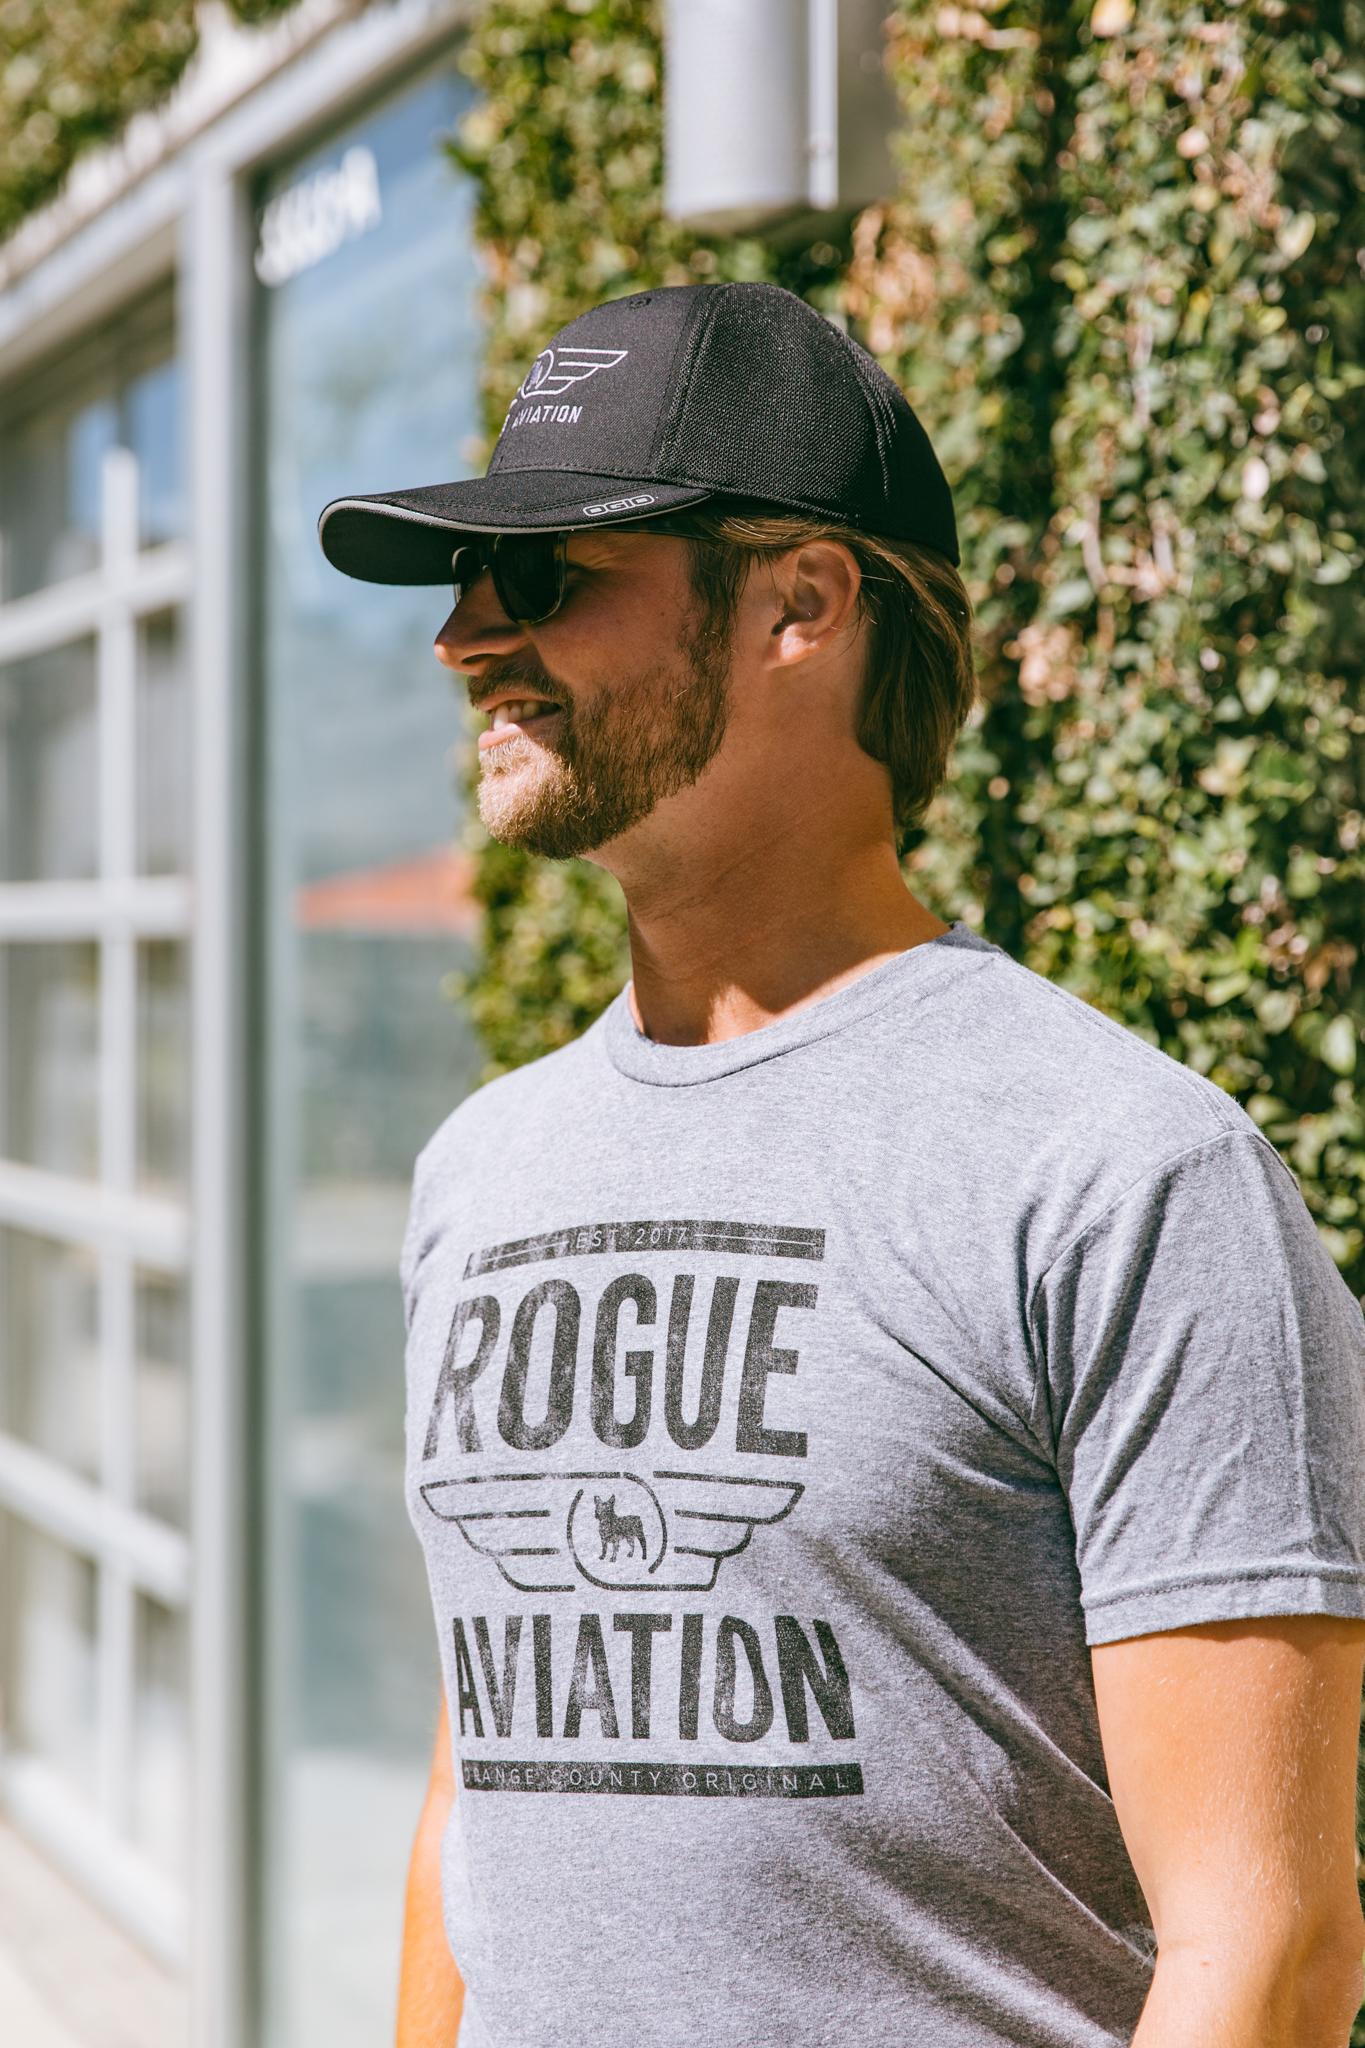 2018-RogueAviationStore-021.jpg